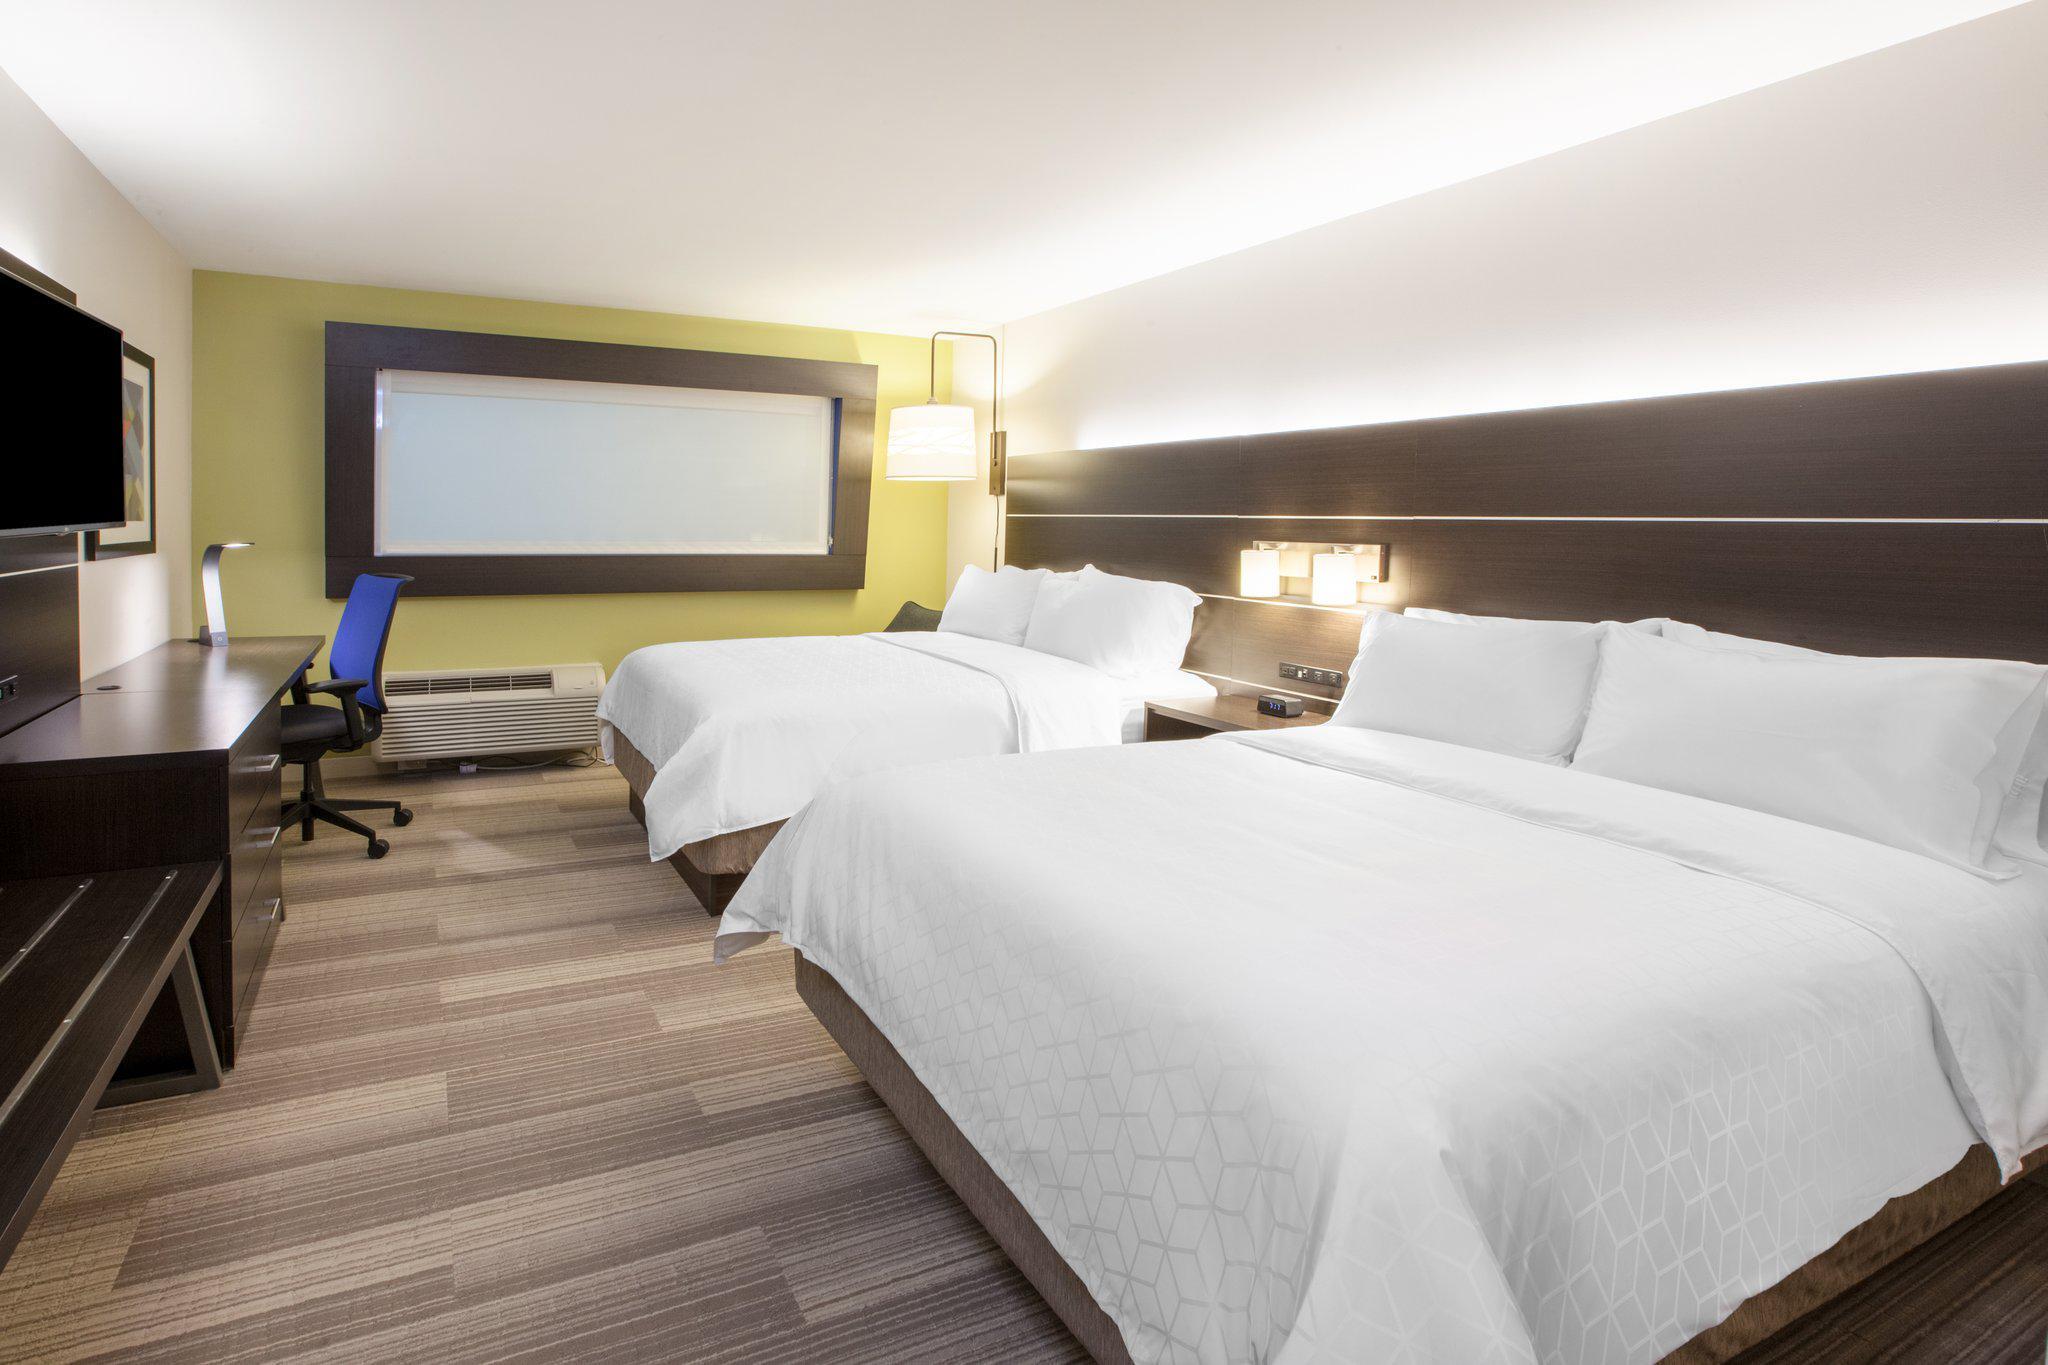 Holiday Inn Express & Suites Edmonton N - St. Albert, an IHG Hotel